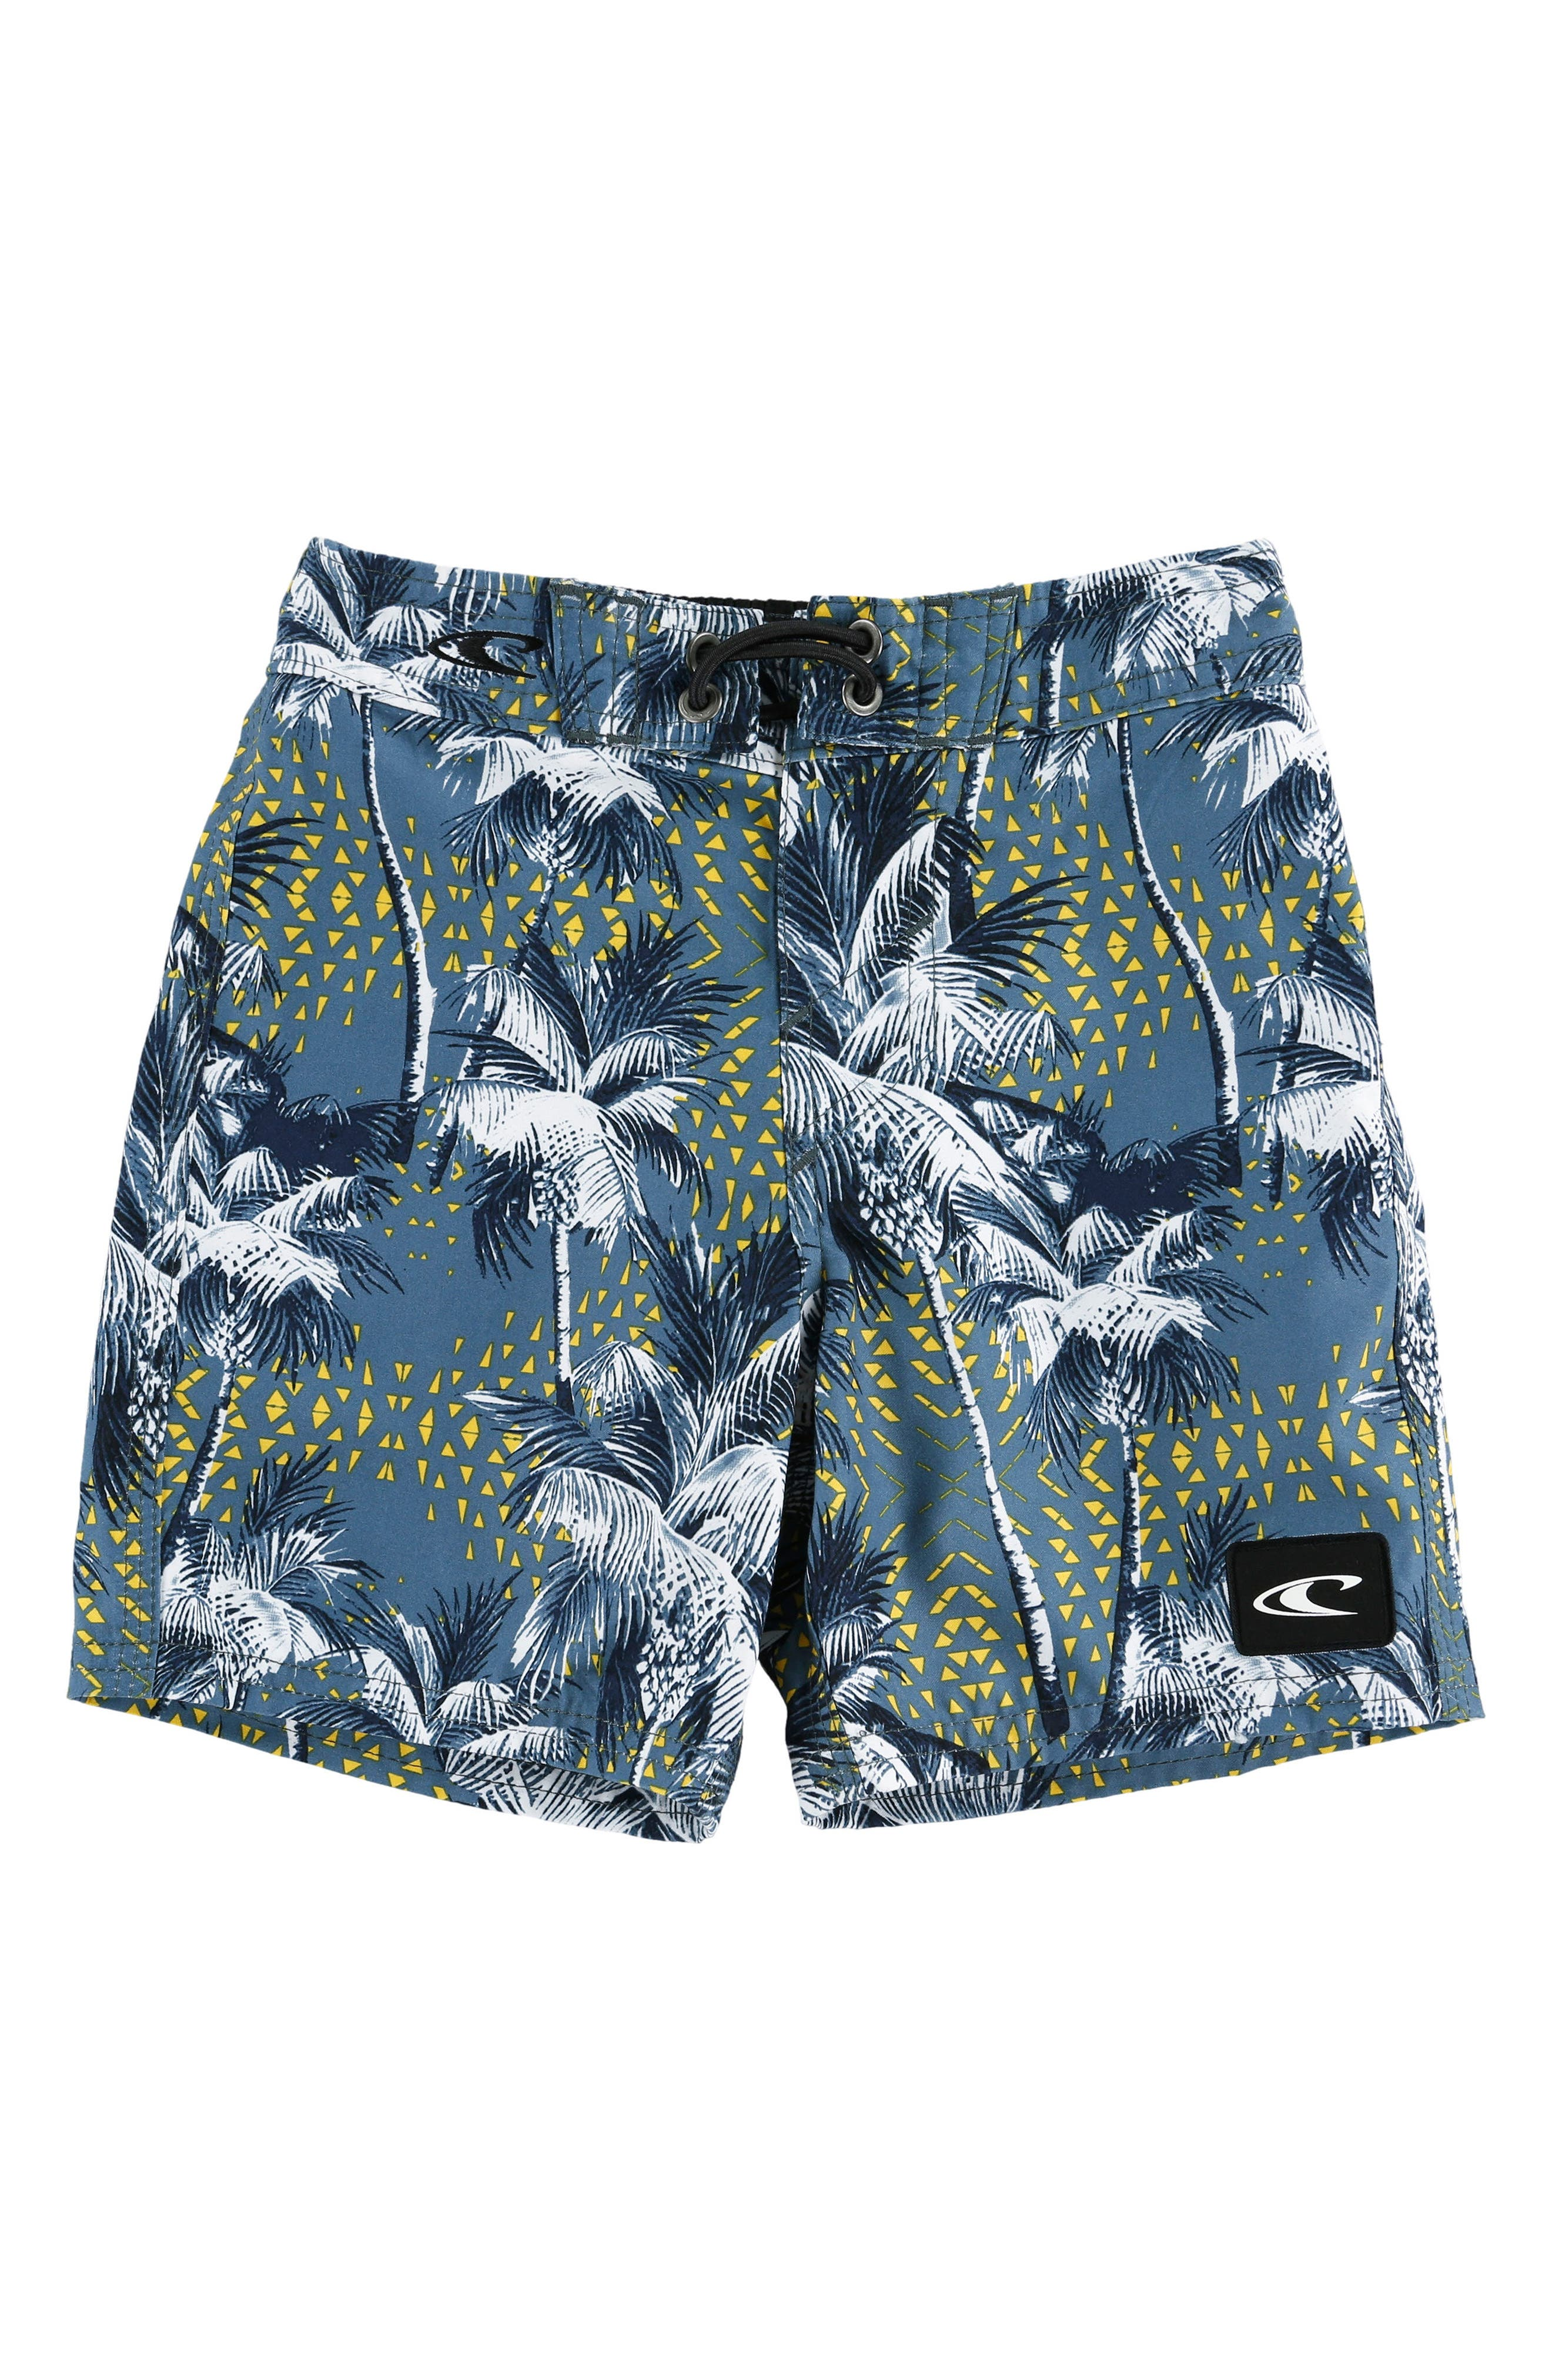 Darn Old Palmer Board Shorts,                         Main,                         color, DUST BLUE